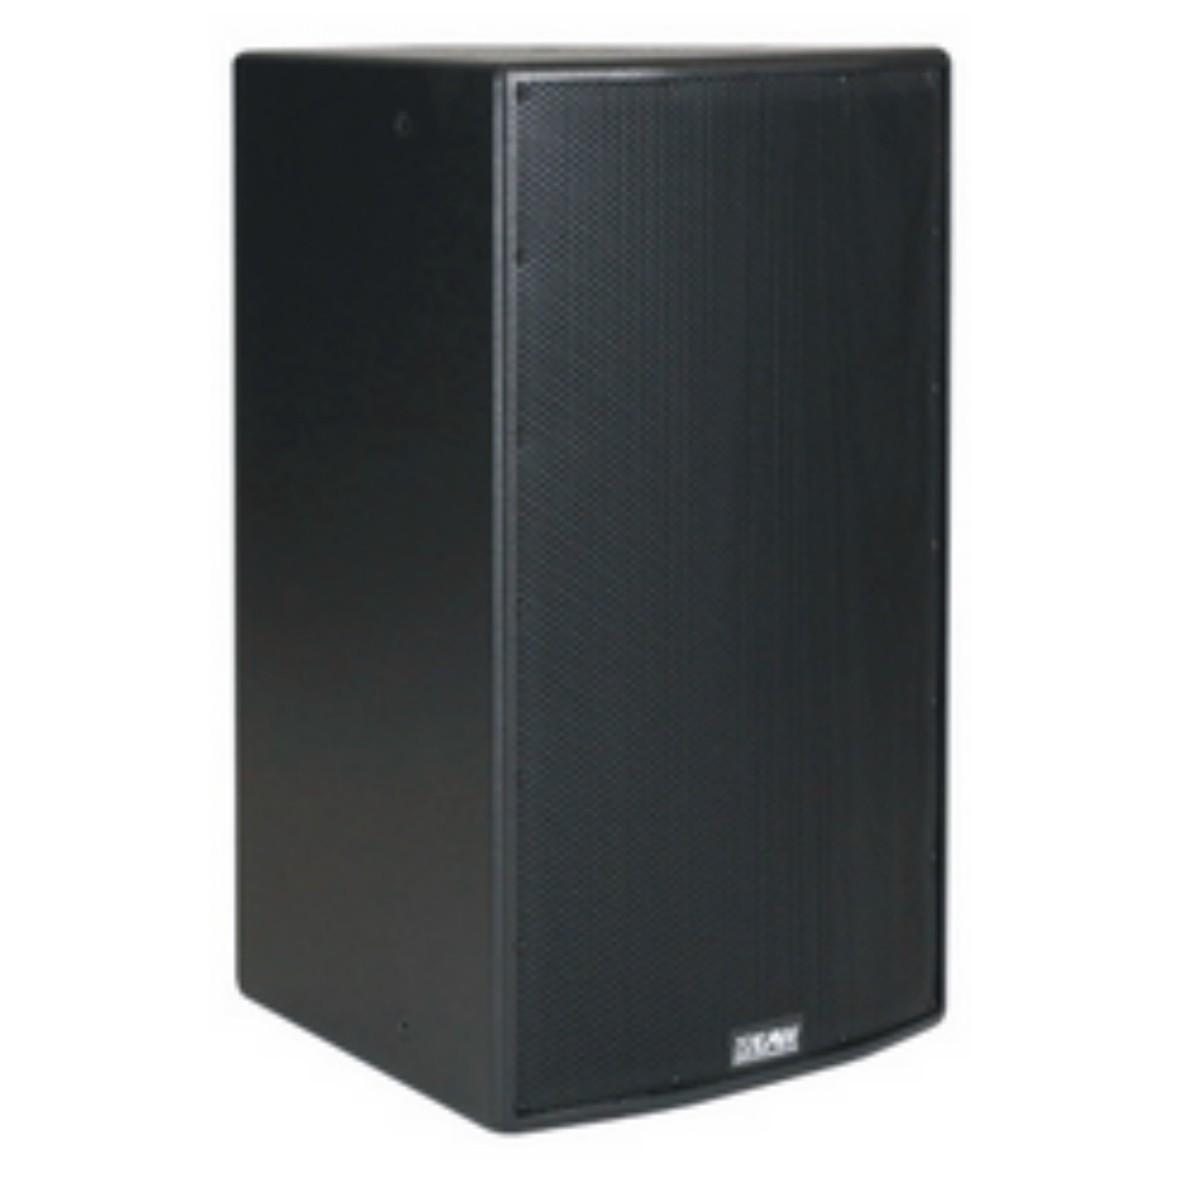 MK5364i 二分频高输出梯形音箱